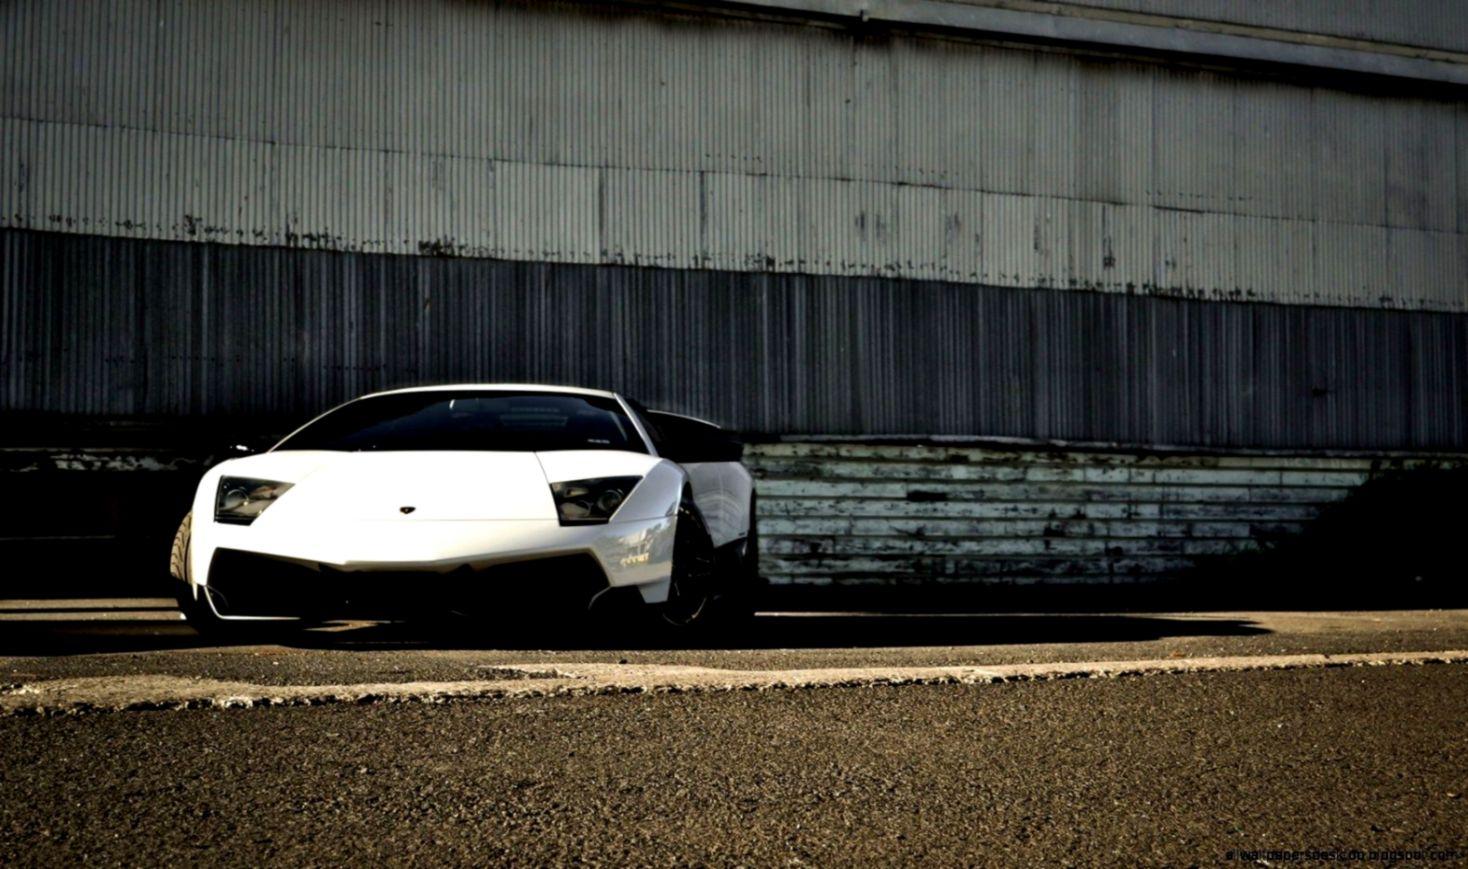 Lamborghini Murcielago Lp 670 4 Sv White Car Hd Wallpaper